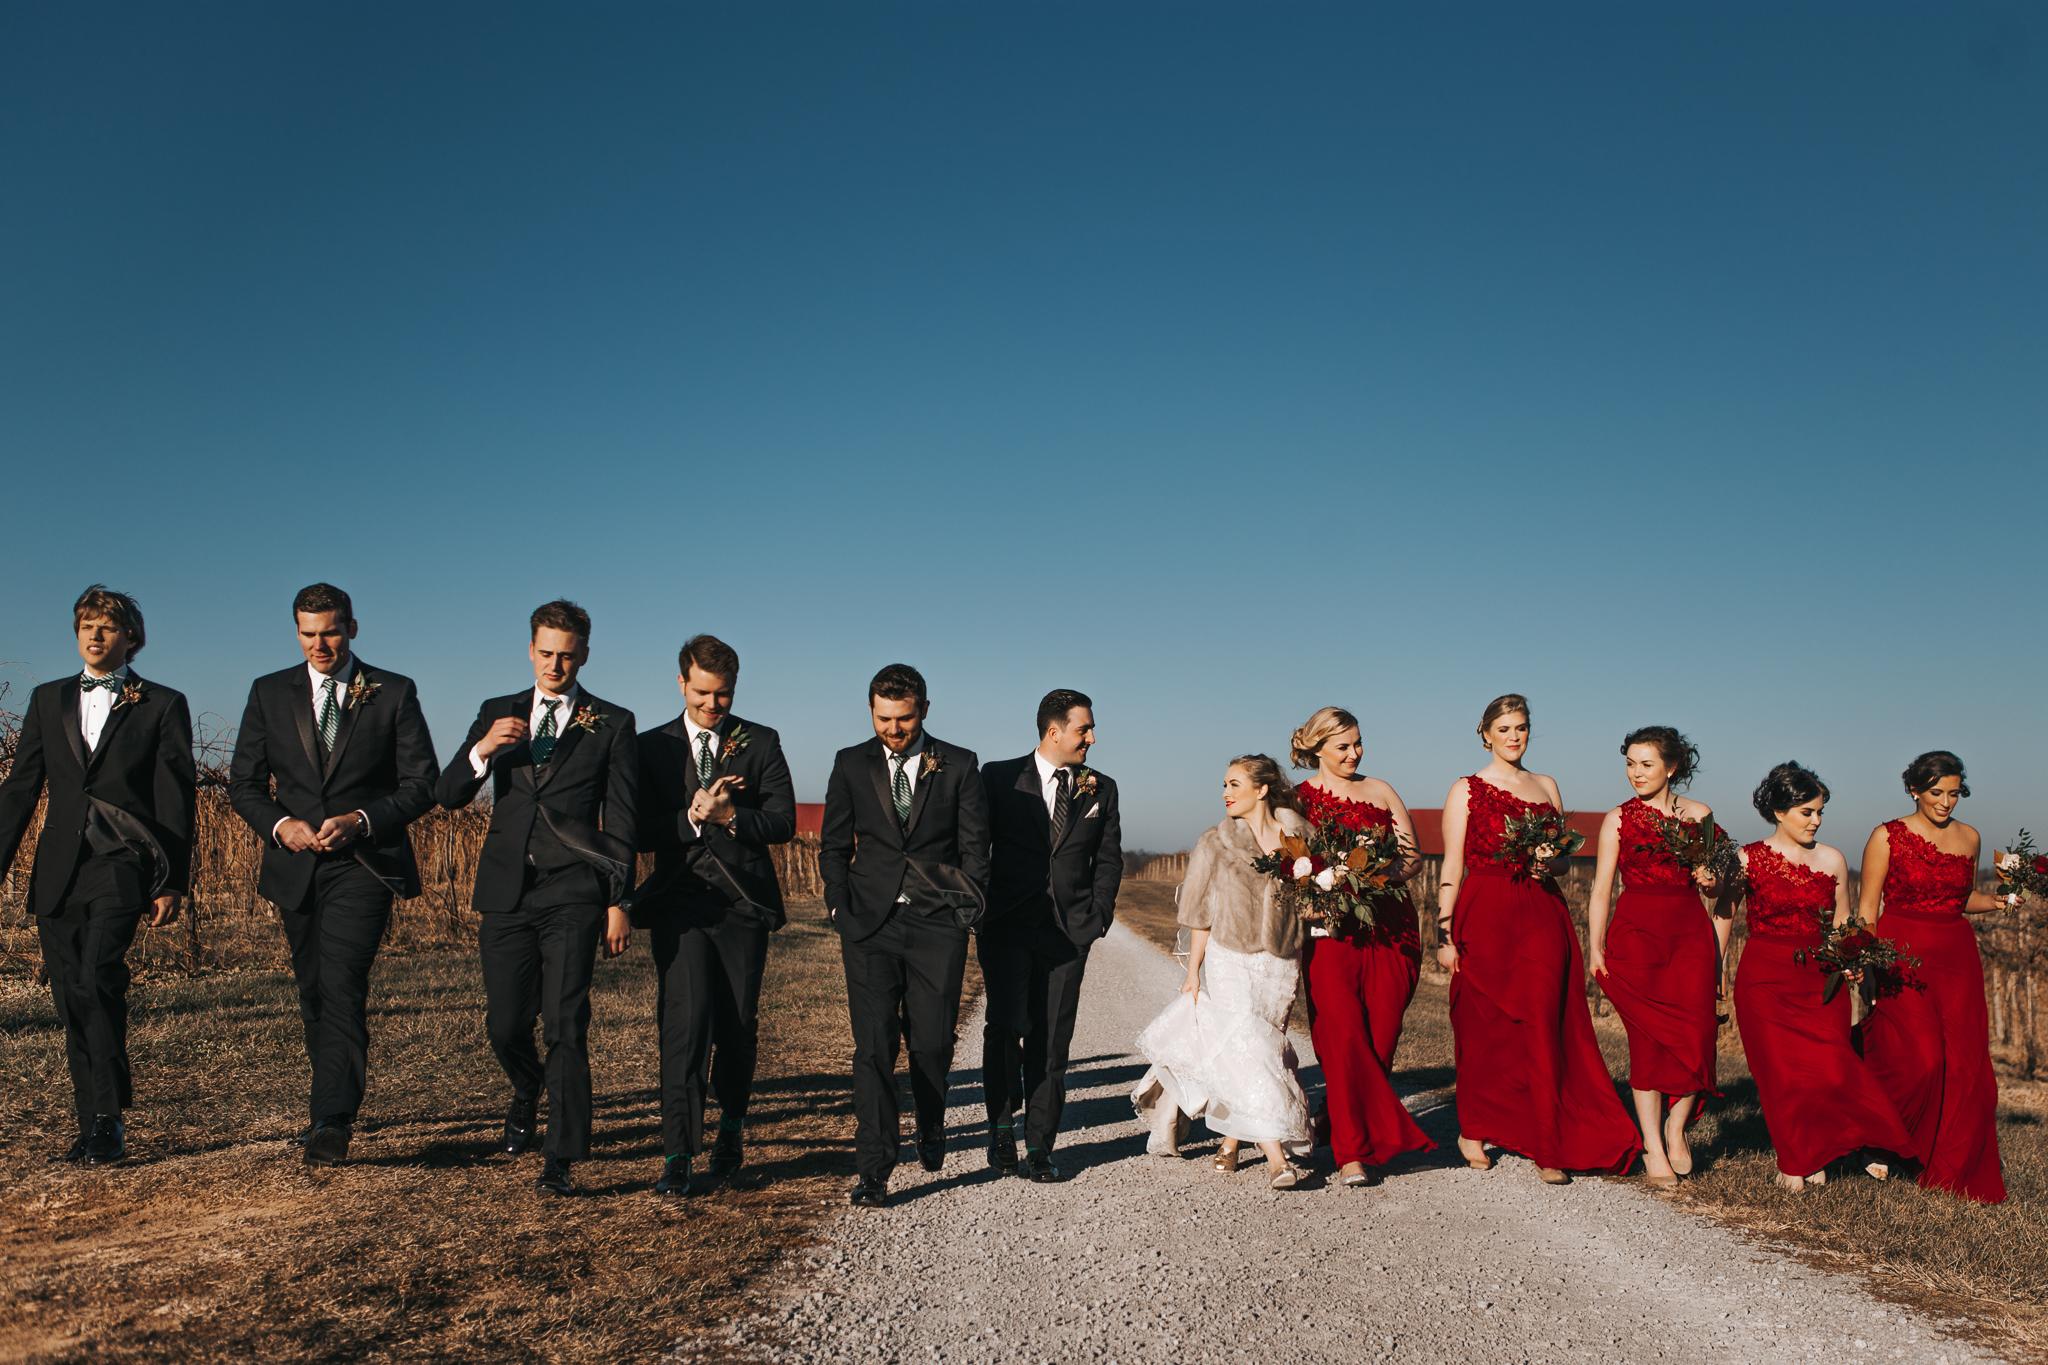 0087 Ariana Jordan Photo - Cameron & Lauren's Wedding at Talon Winery _.jpg